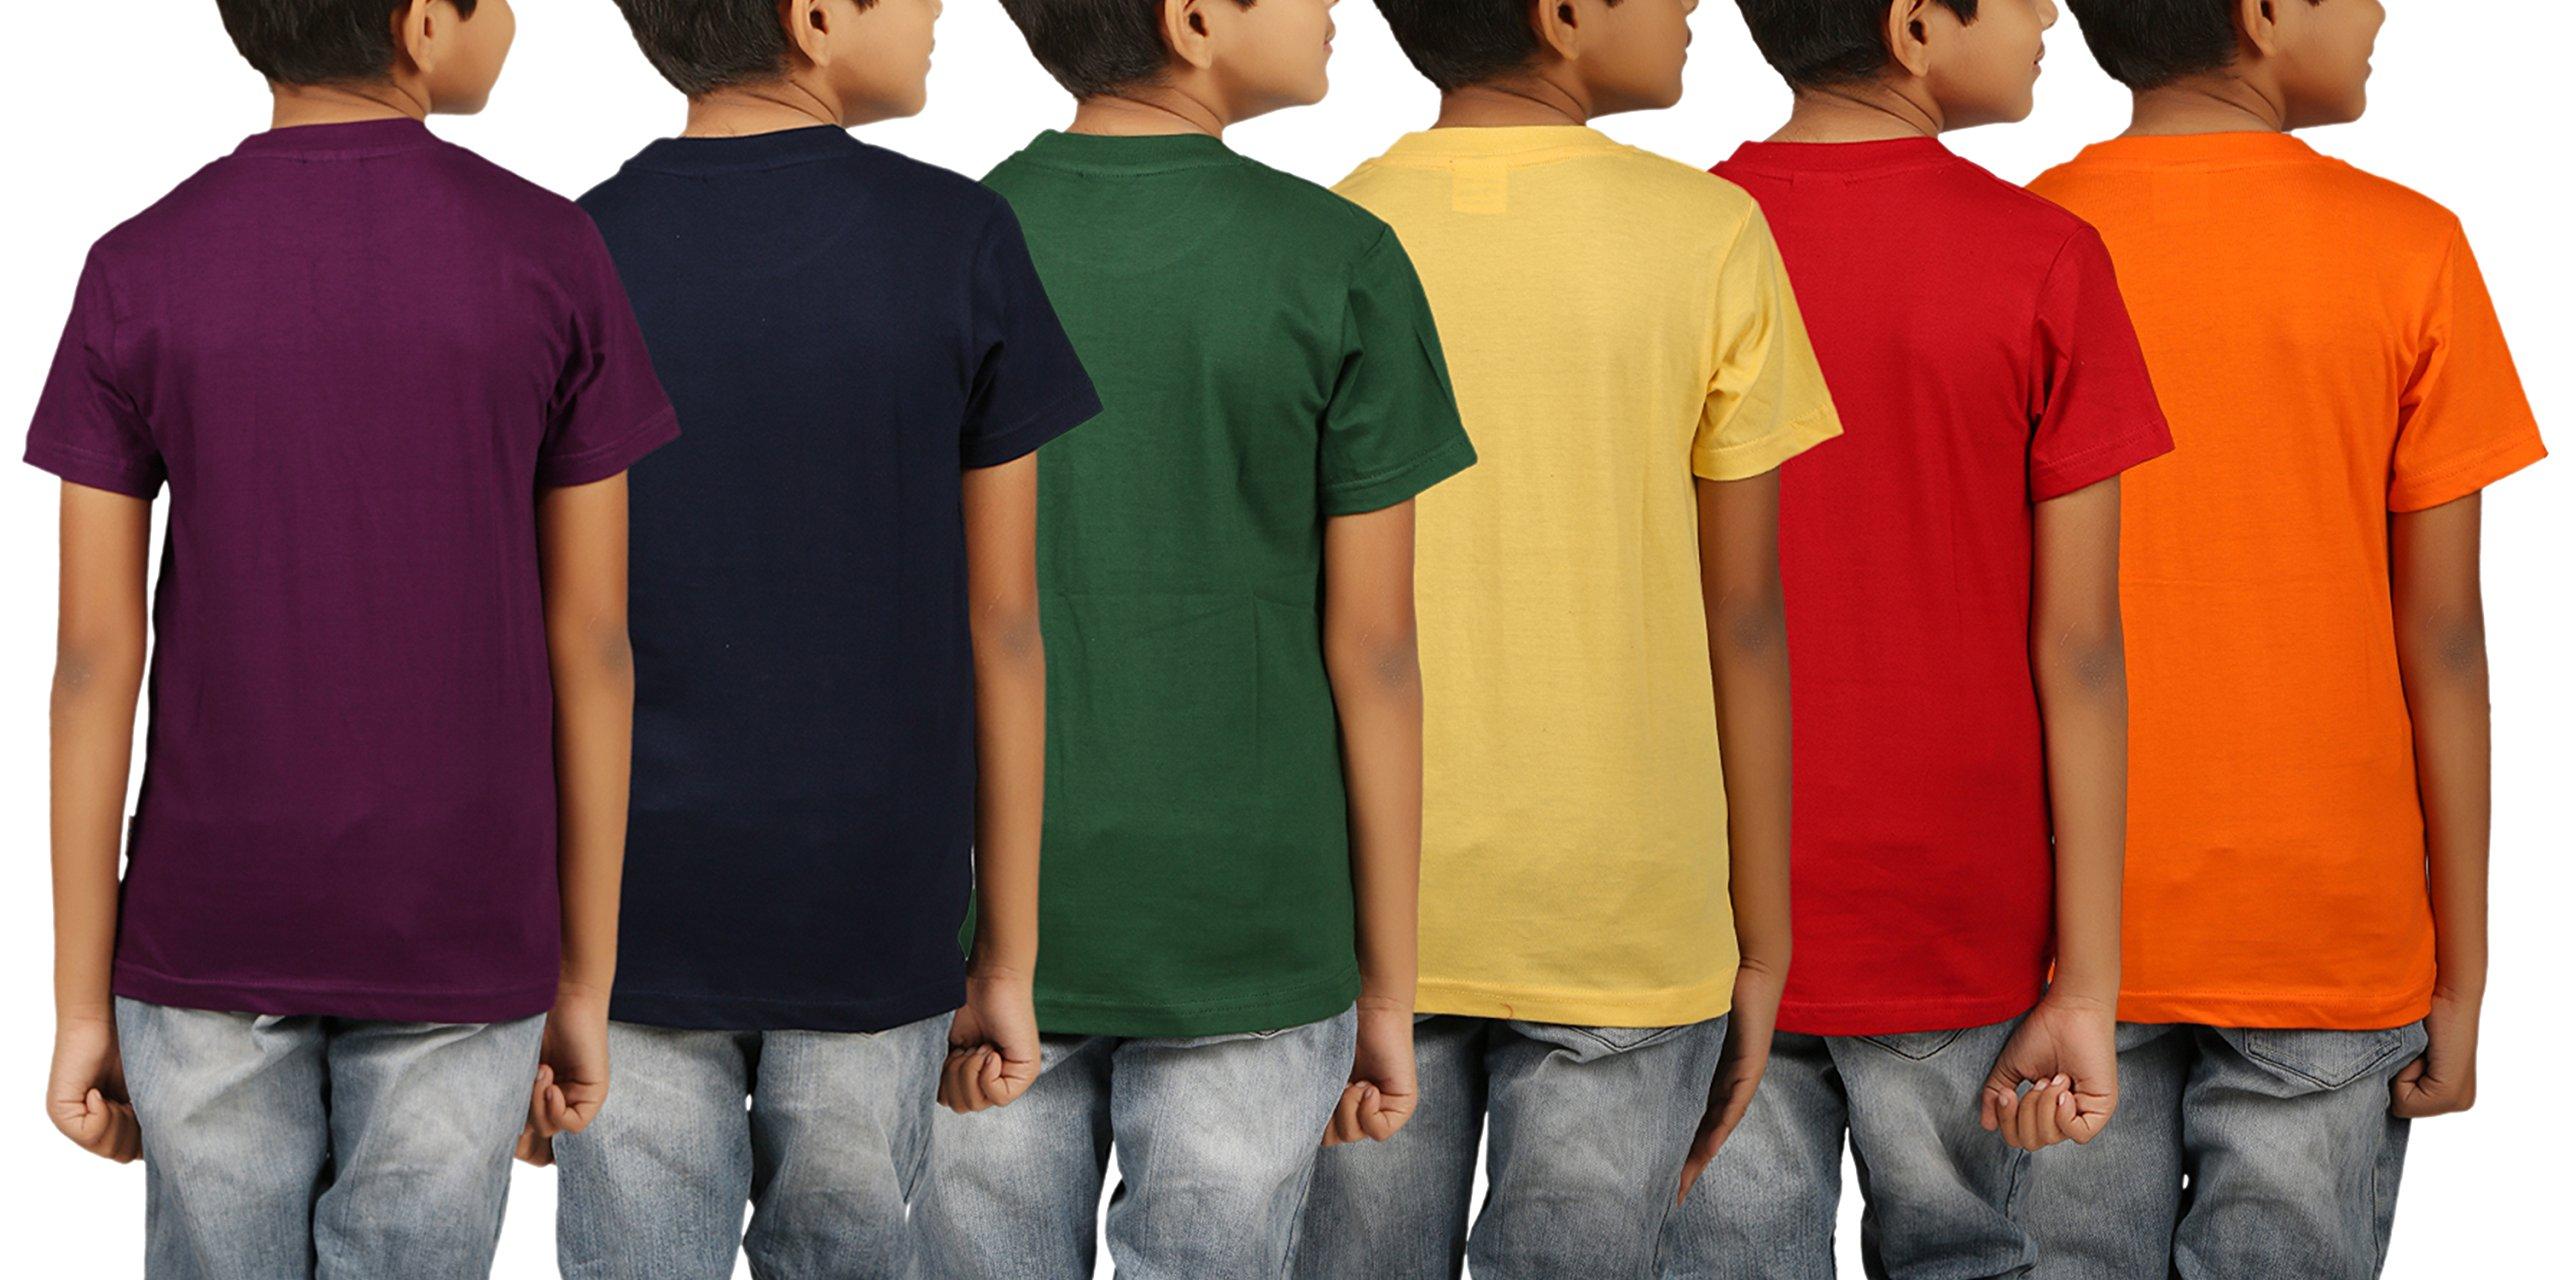 3959d82aeeff2 Kiddeo Boy s Cotton T-Shirt - Pack of 6